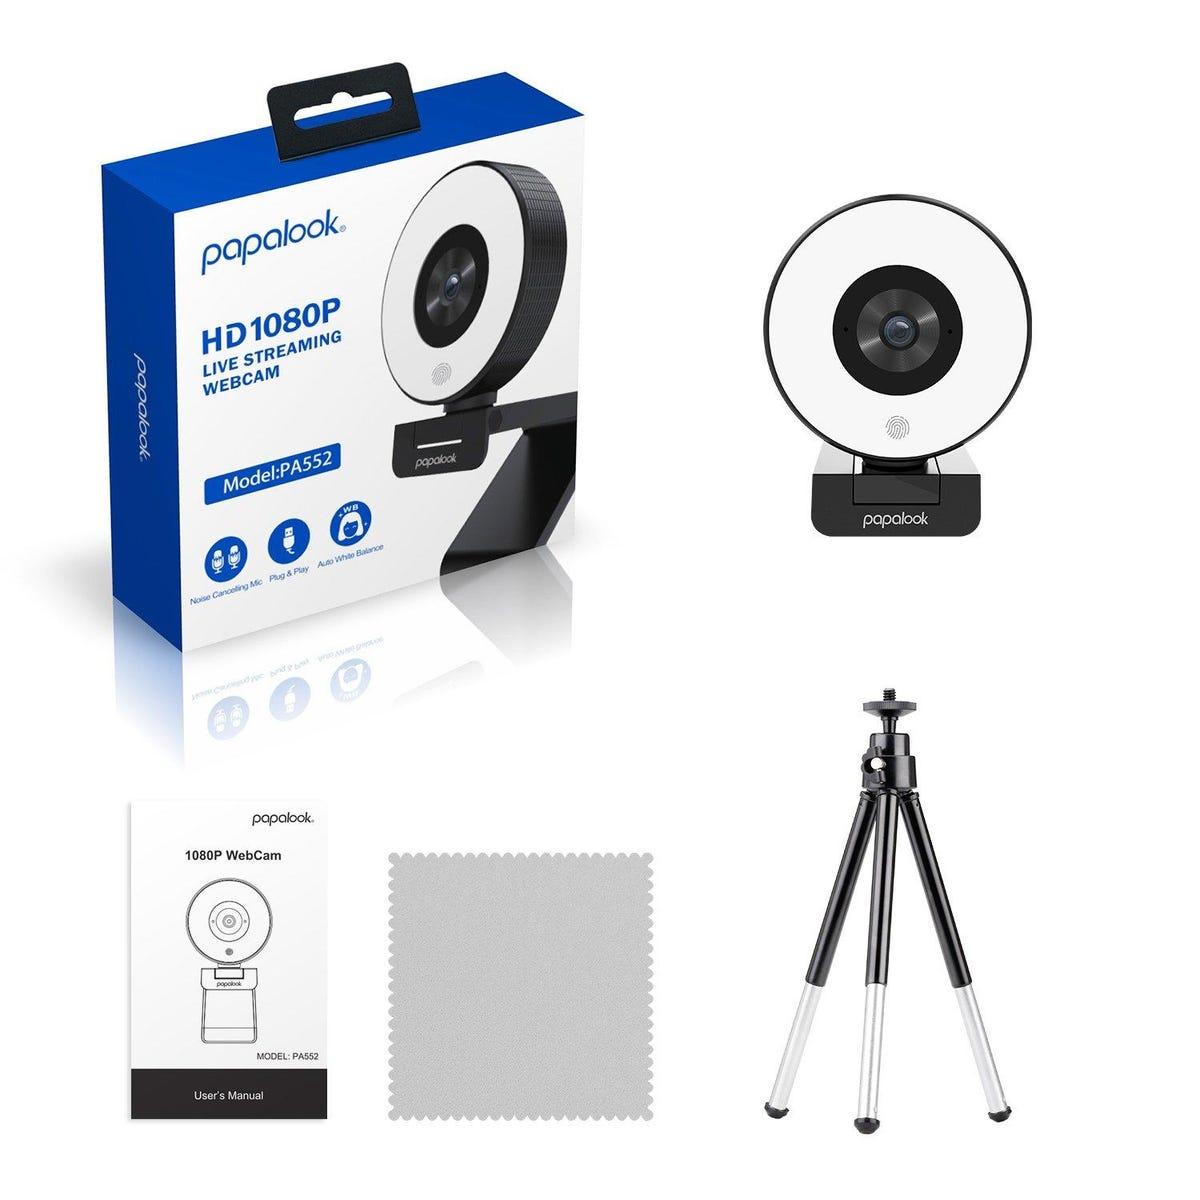 Paplook pa552 webcam